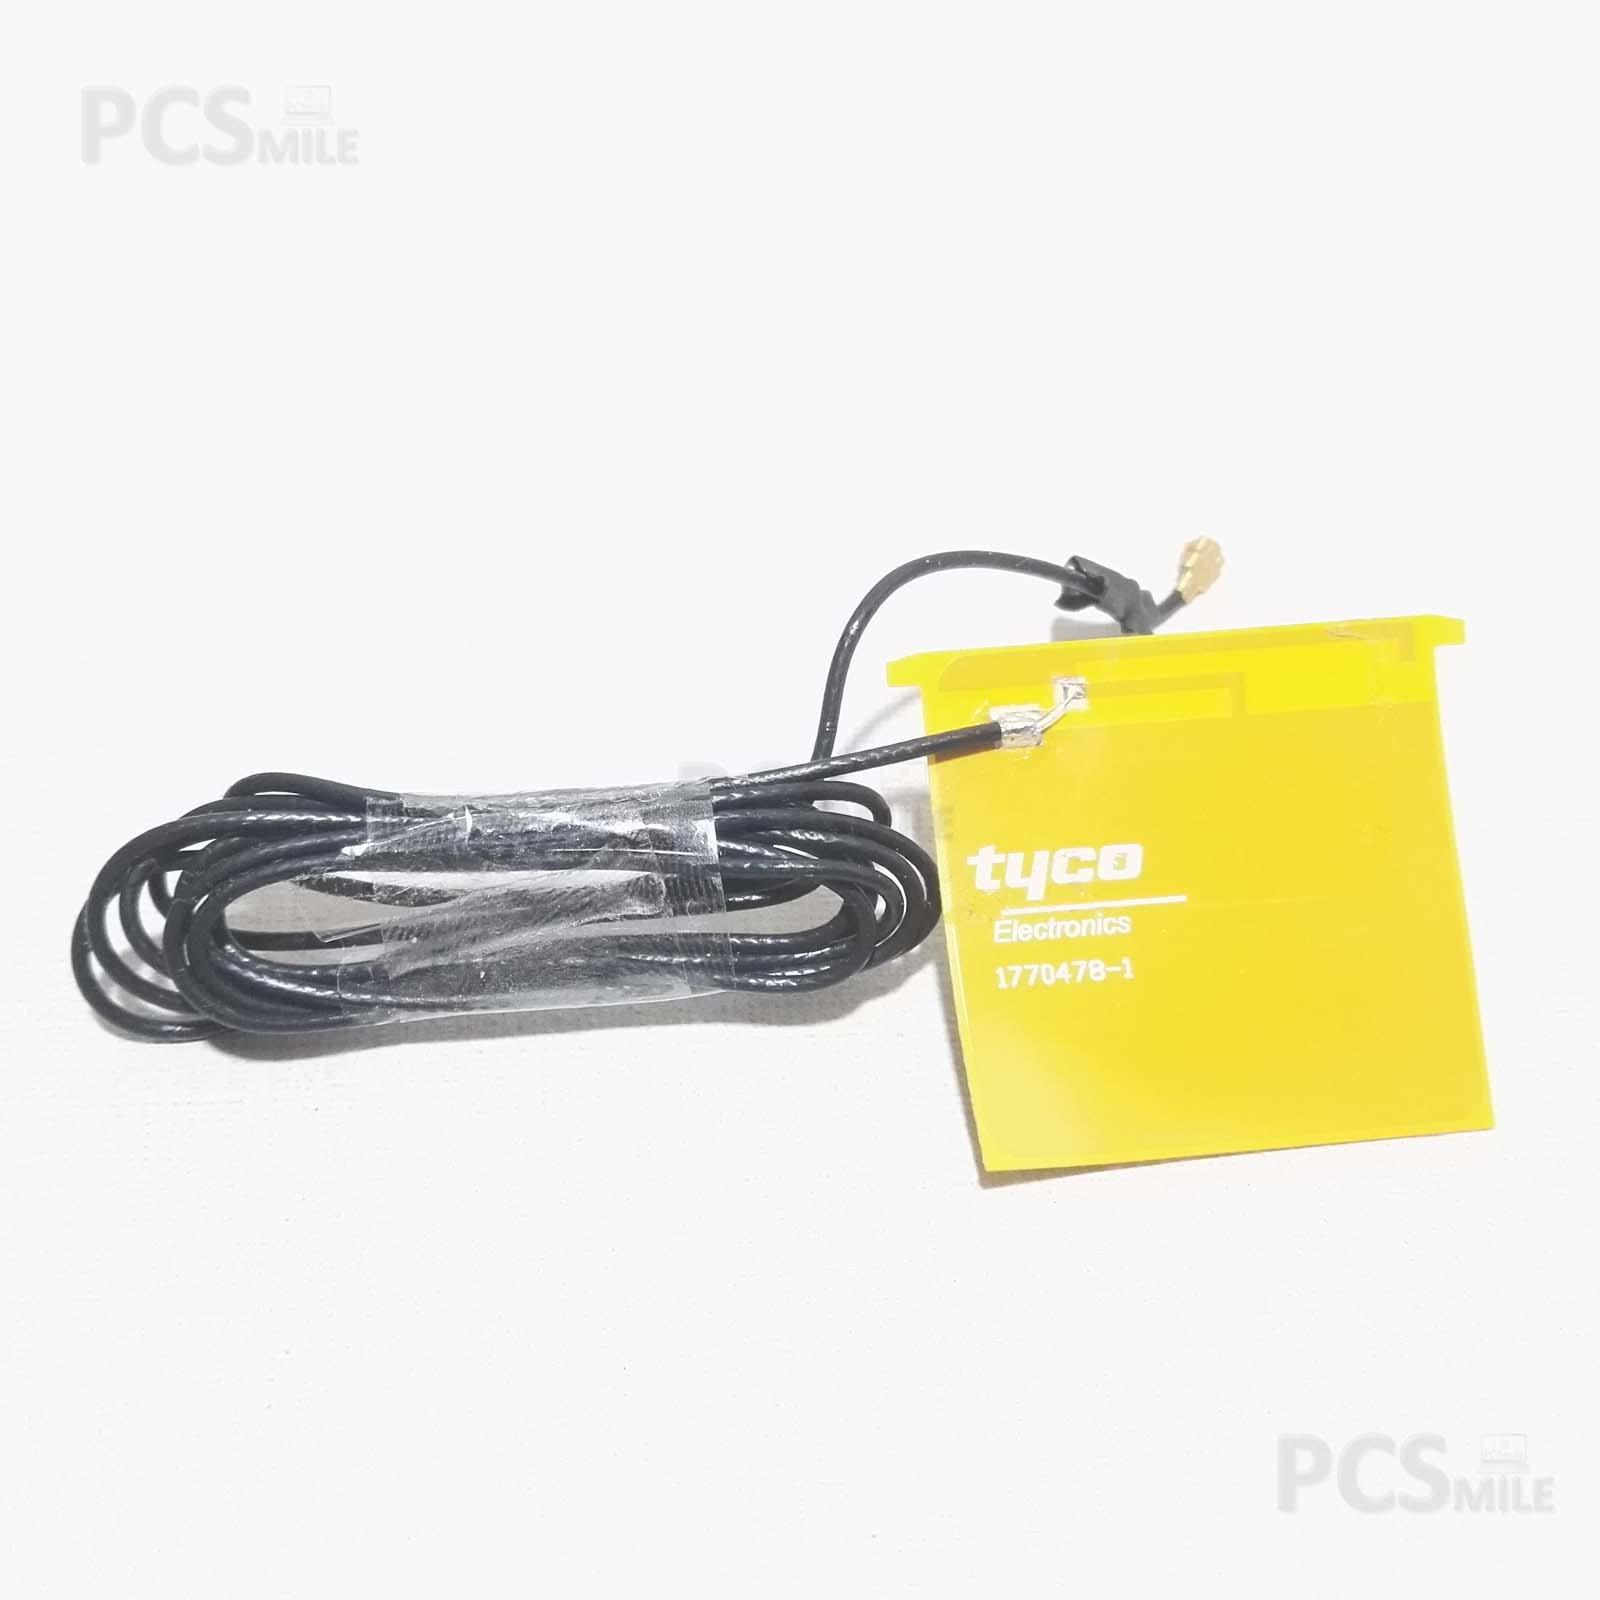 Antenna WiFi Toshiba Satellite A100 M25-5011AH04 cavo nero cavetto Wireless